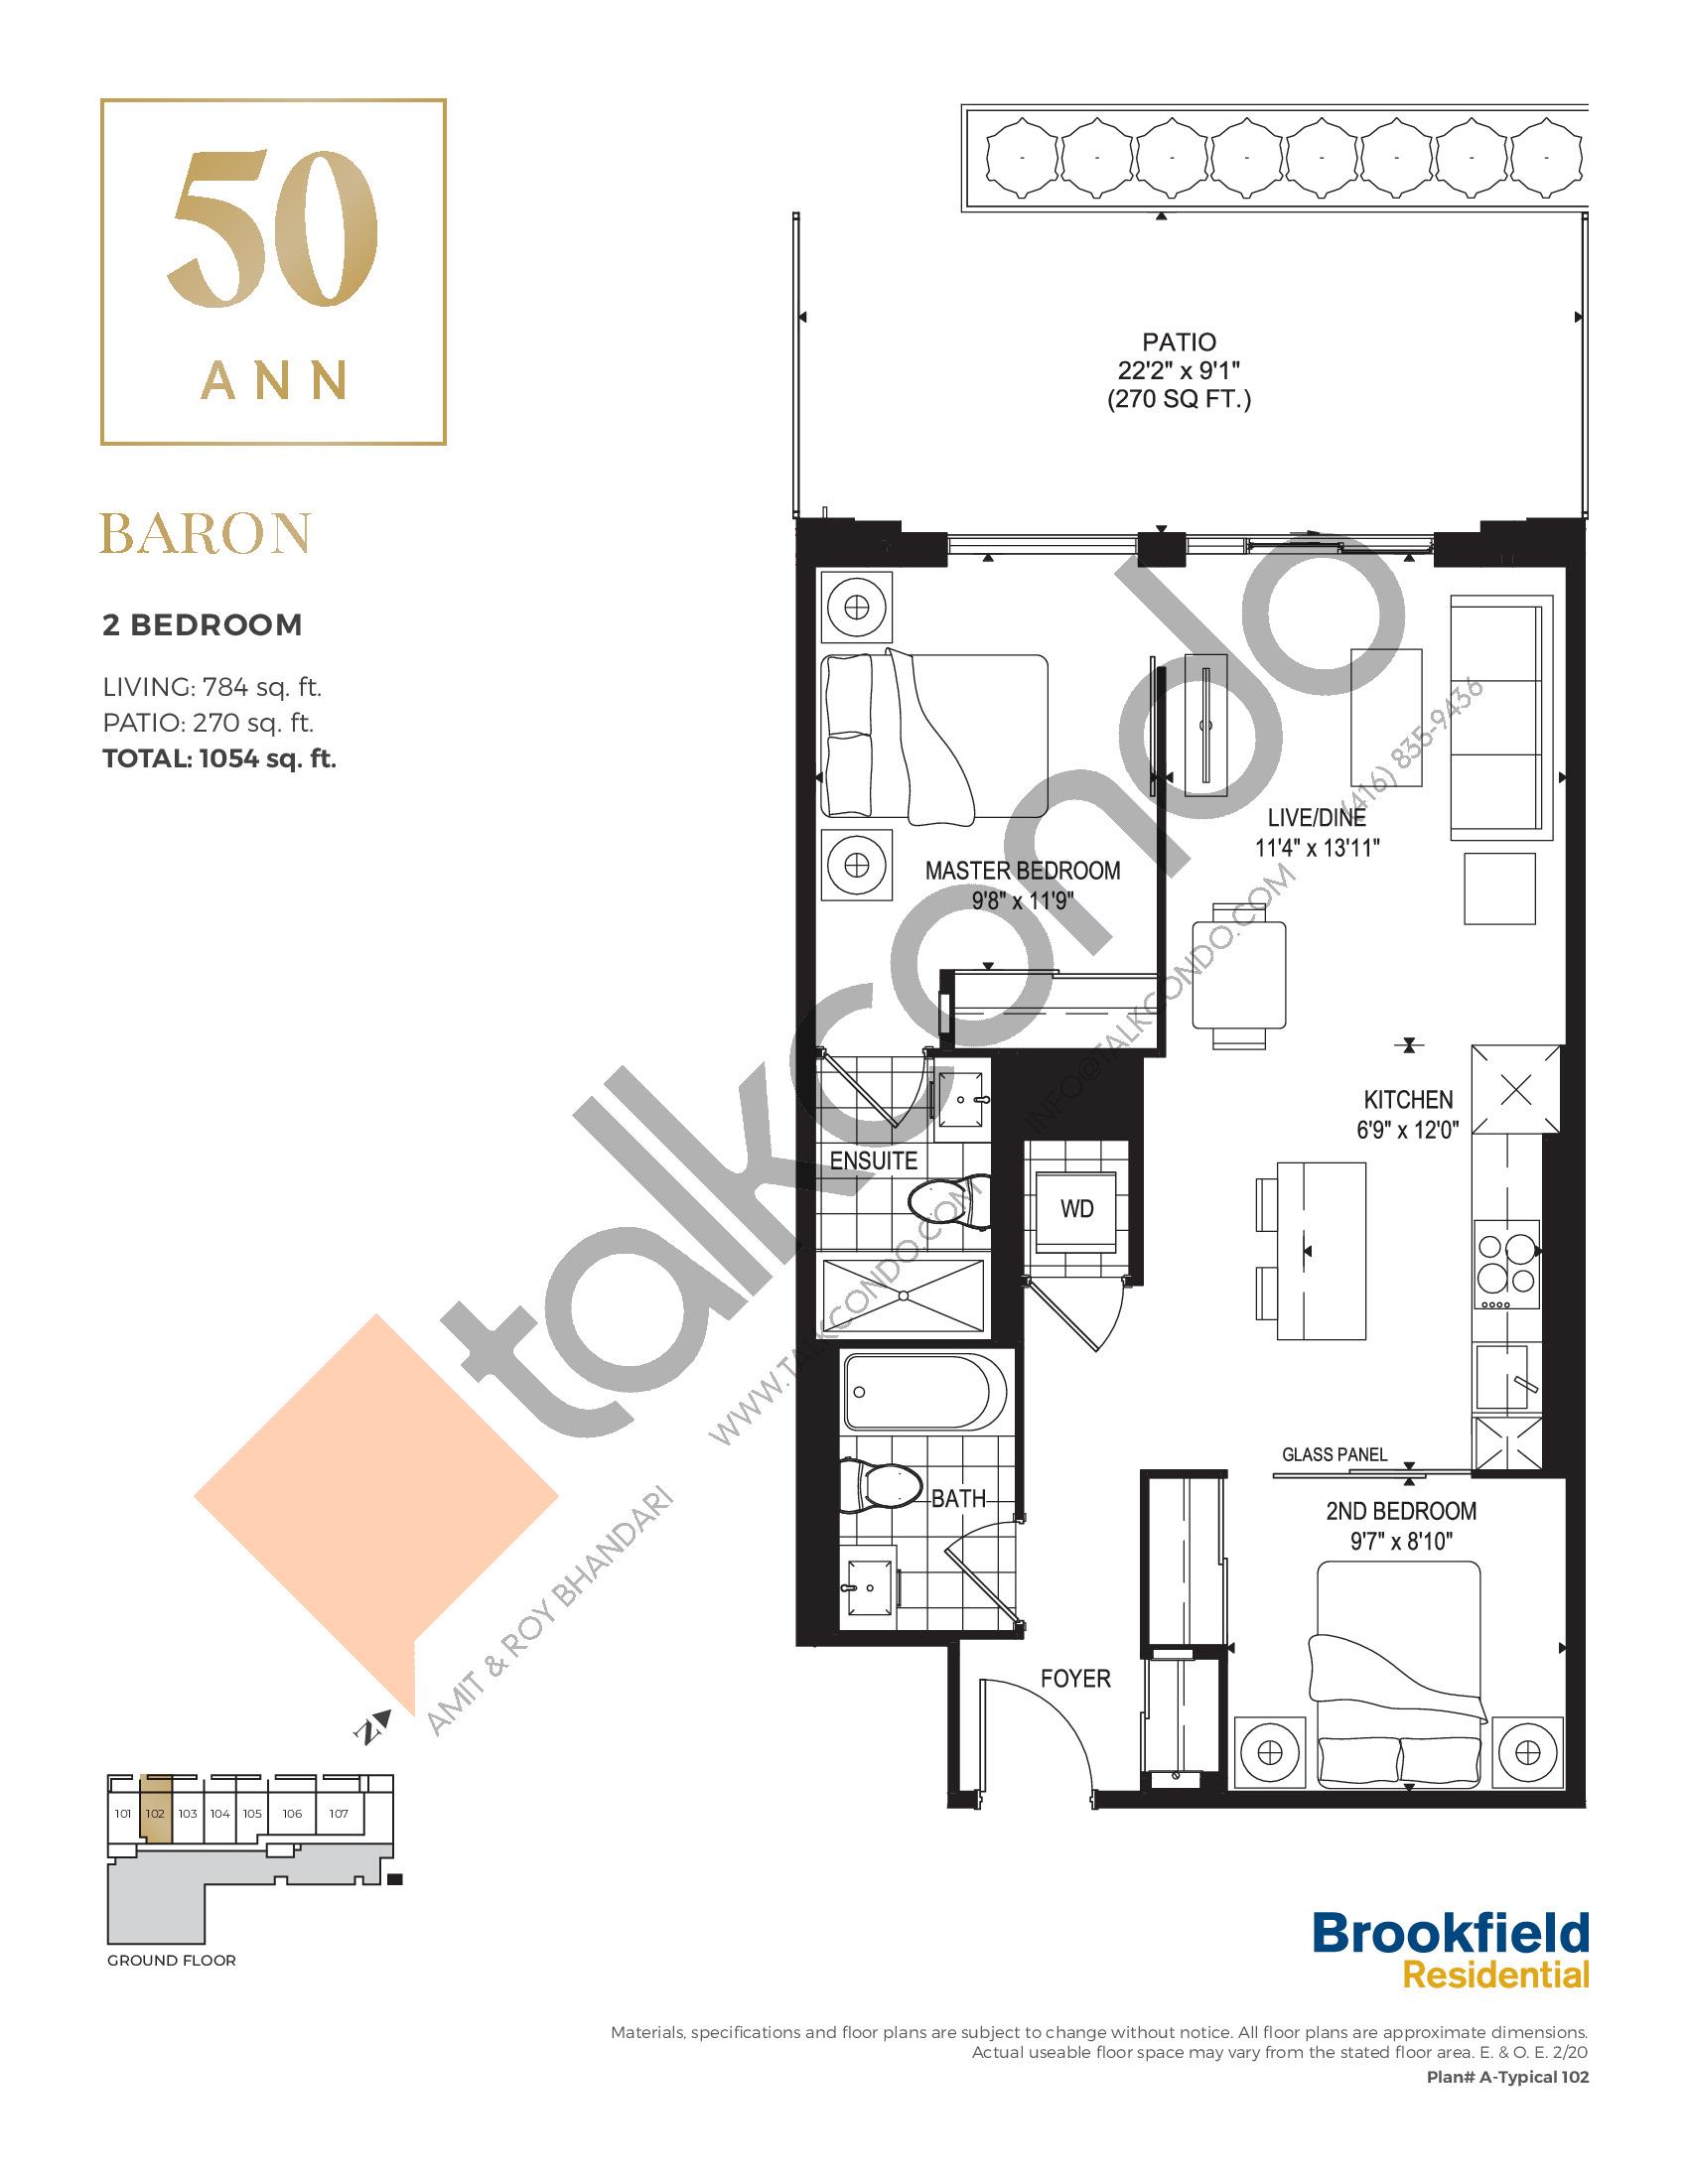 Baron Floor Plan at 50 Ann Condos - 784 sq.ft